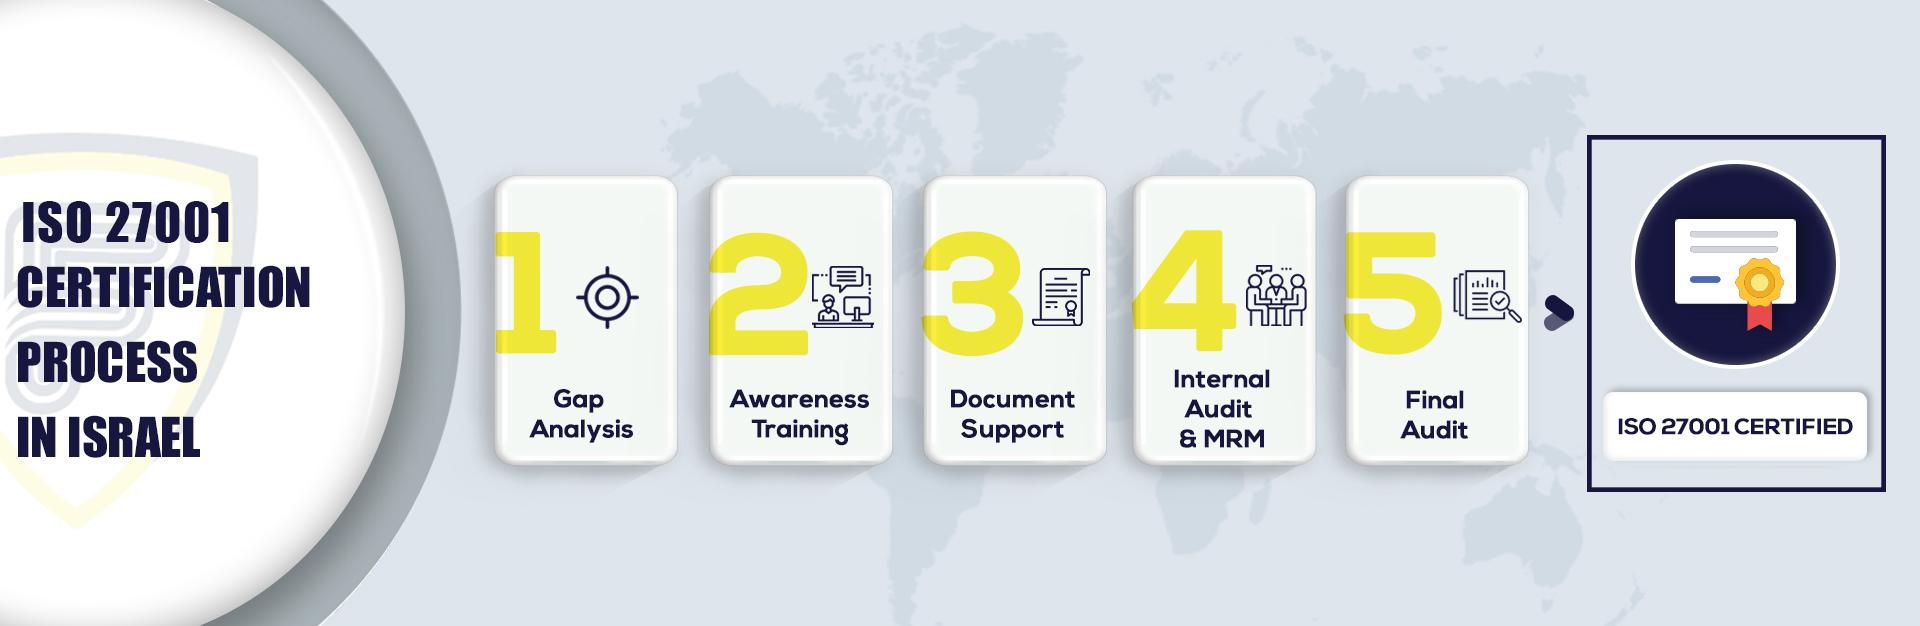 ISO 27001 Certification in Israel